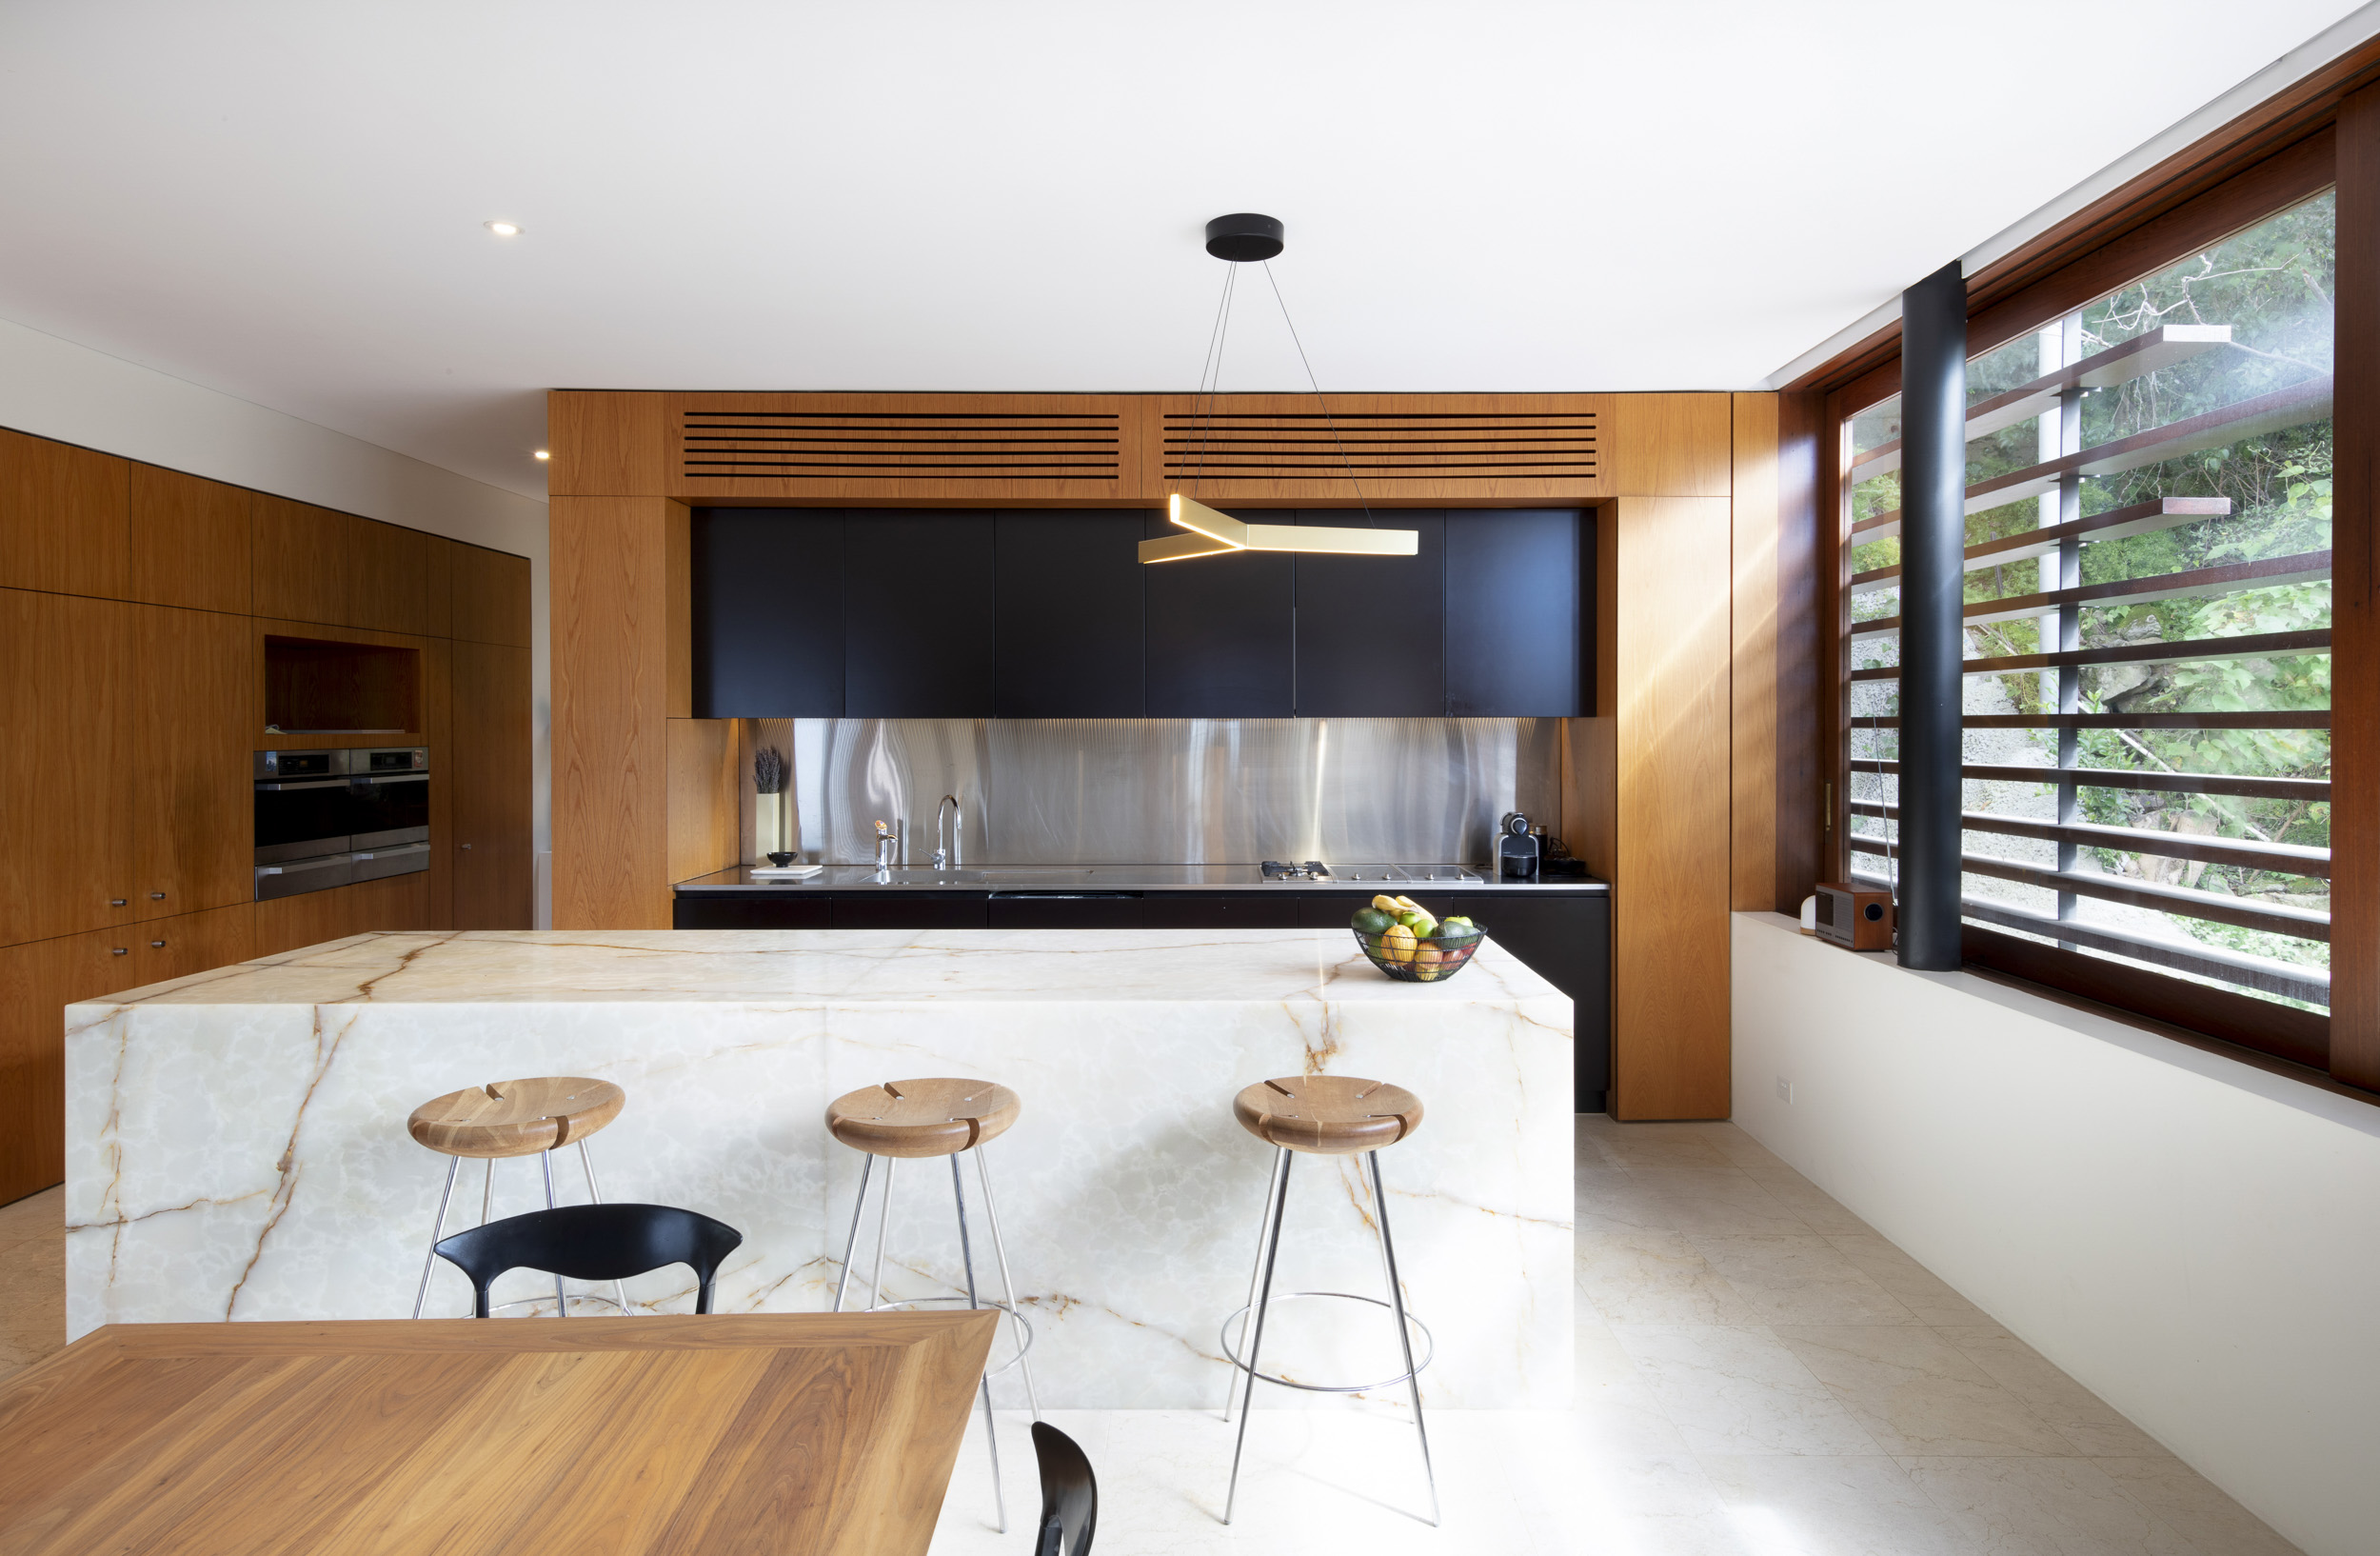 residential_architect_photographer_sydney_23.jpg